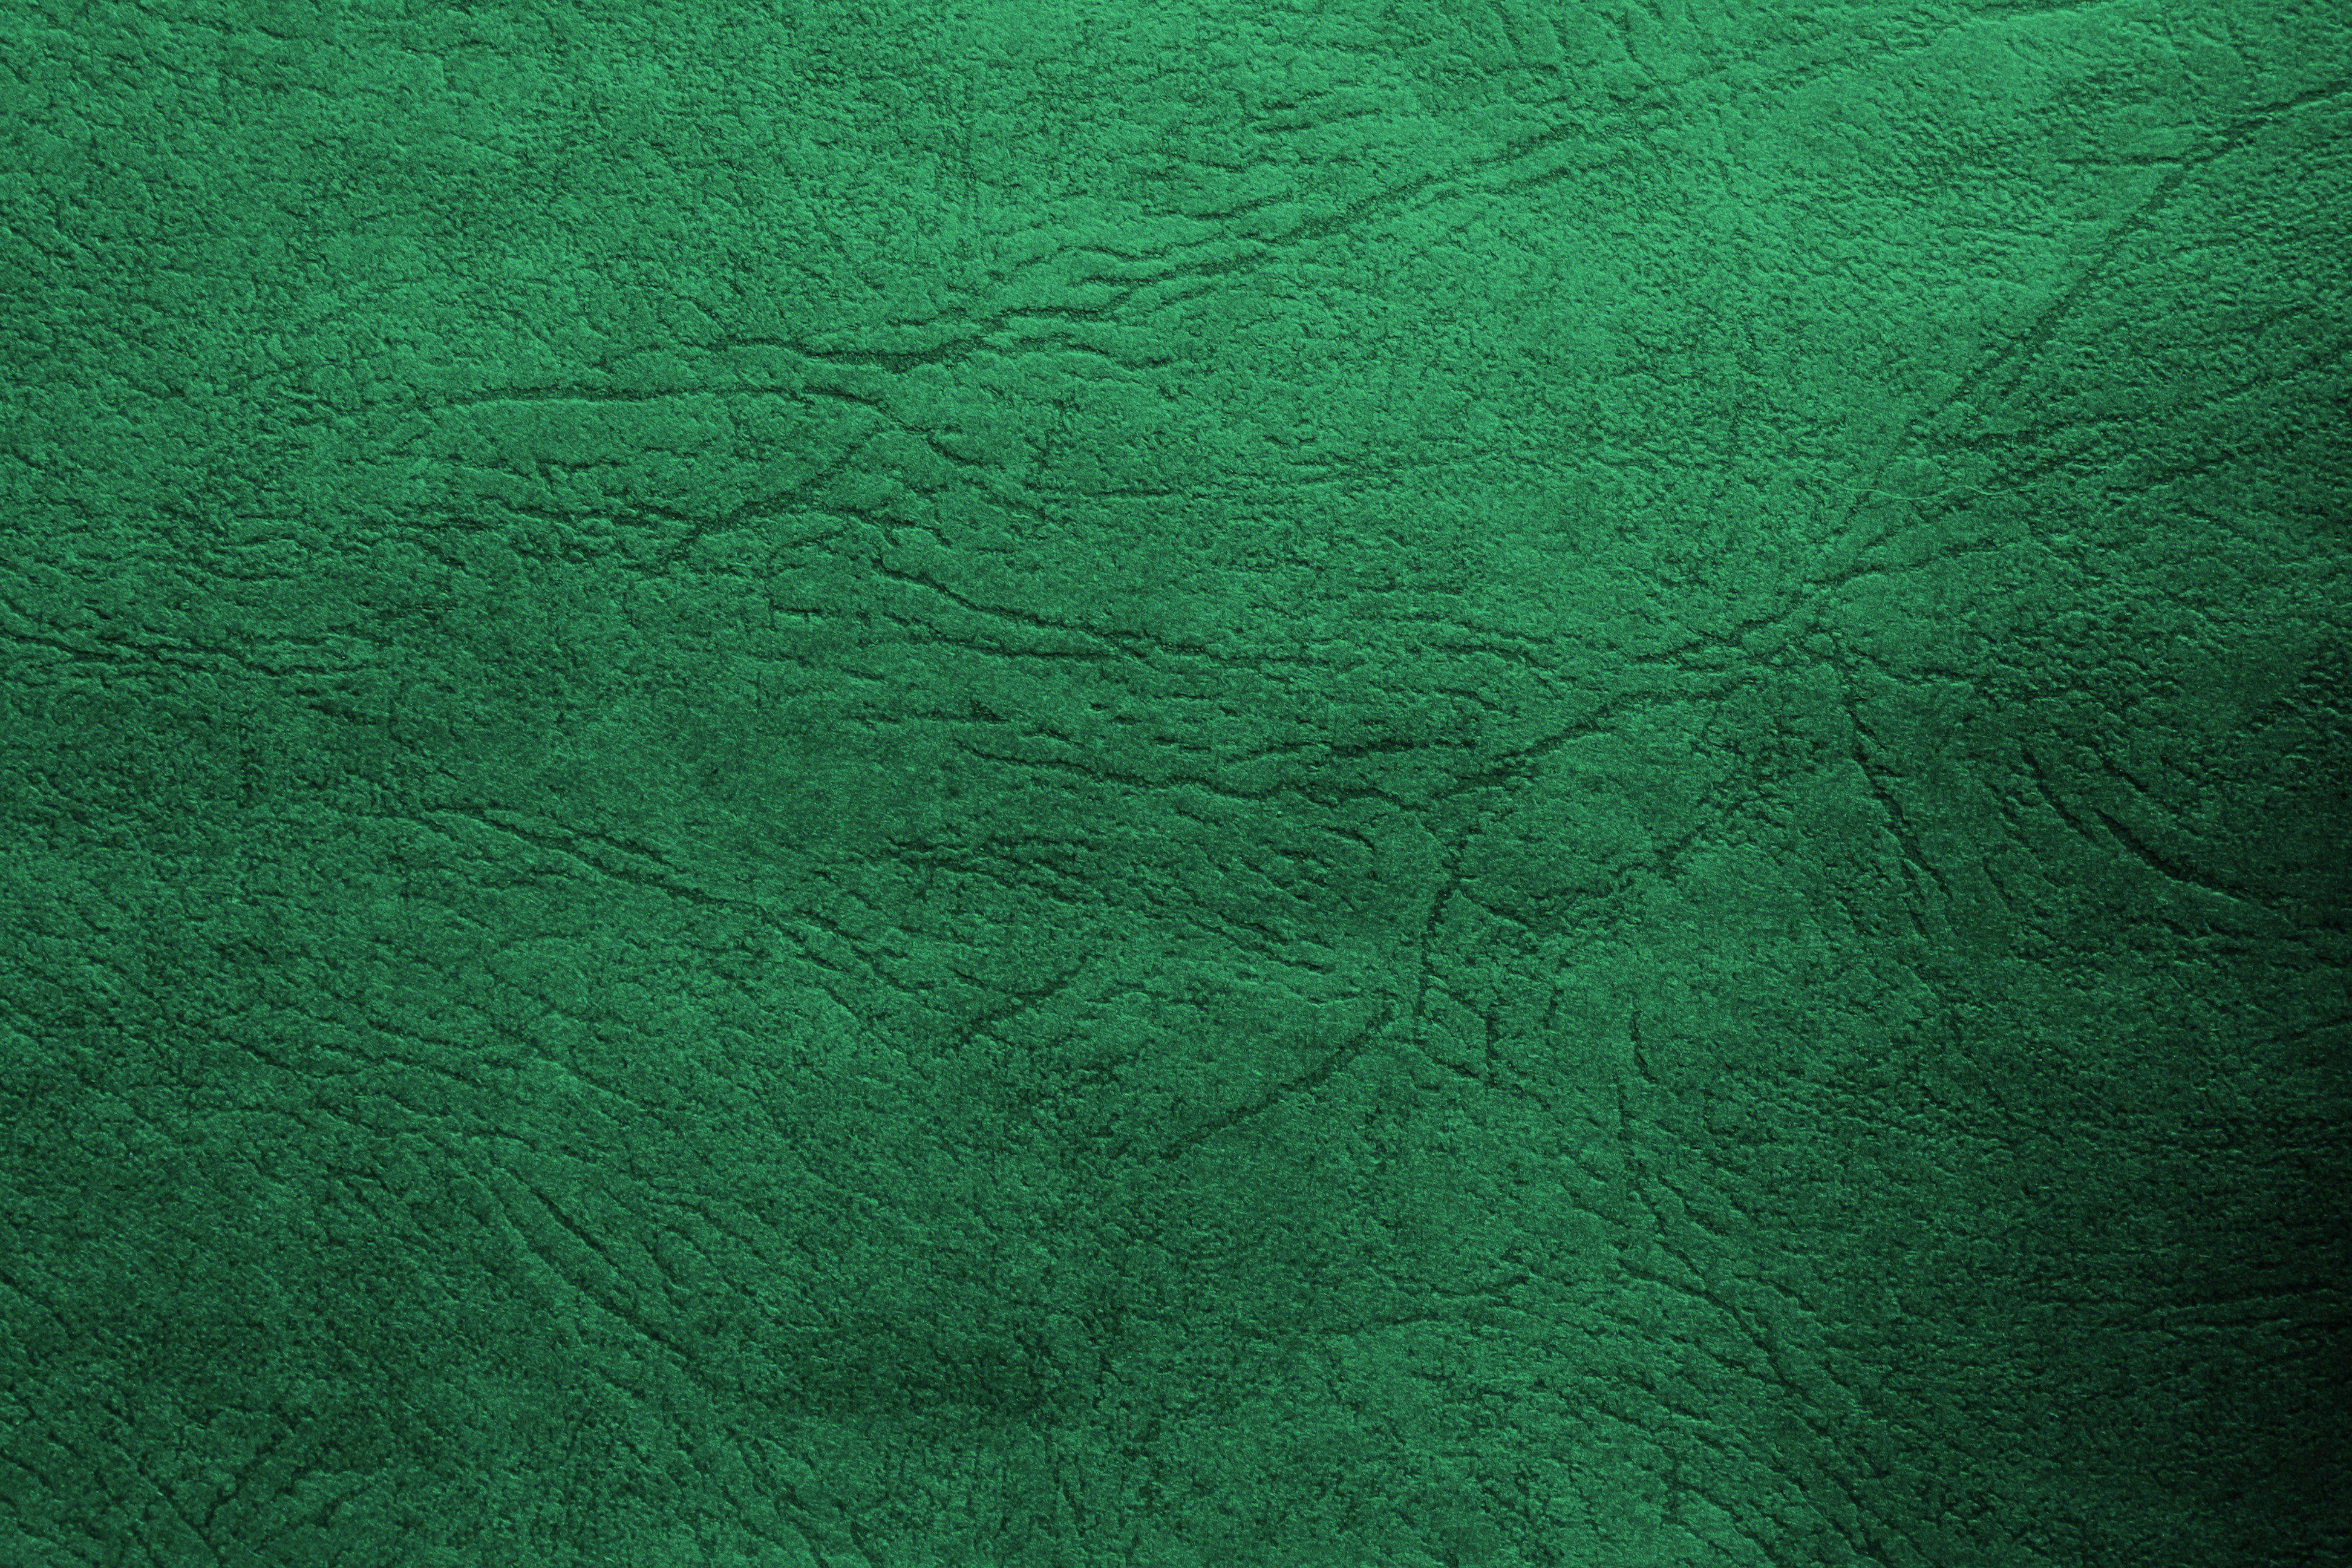 Green Leather Texture Leather Texture Green Leather Green